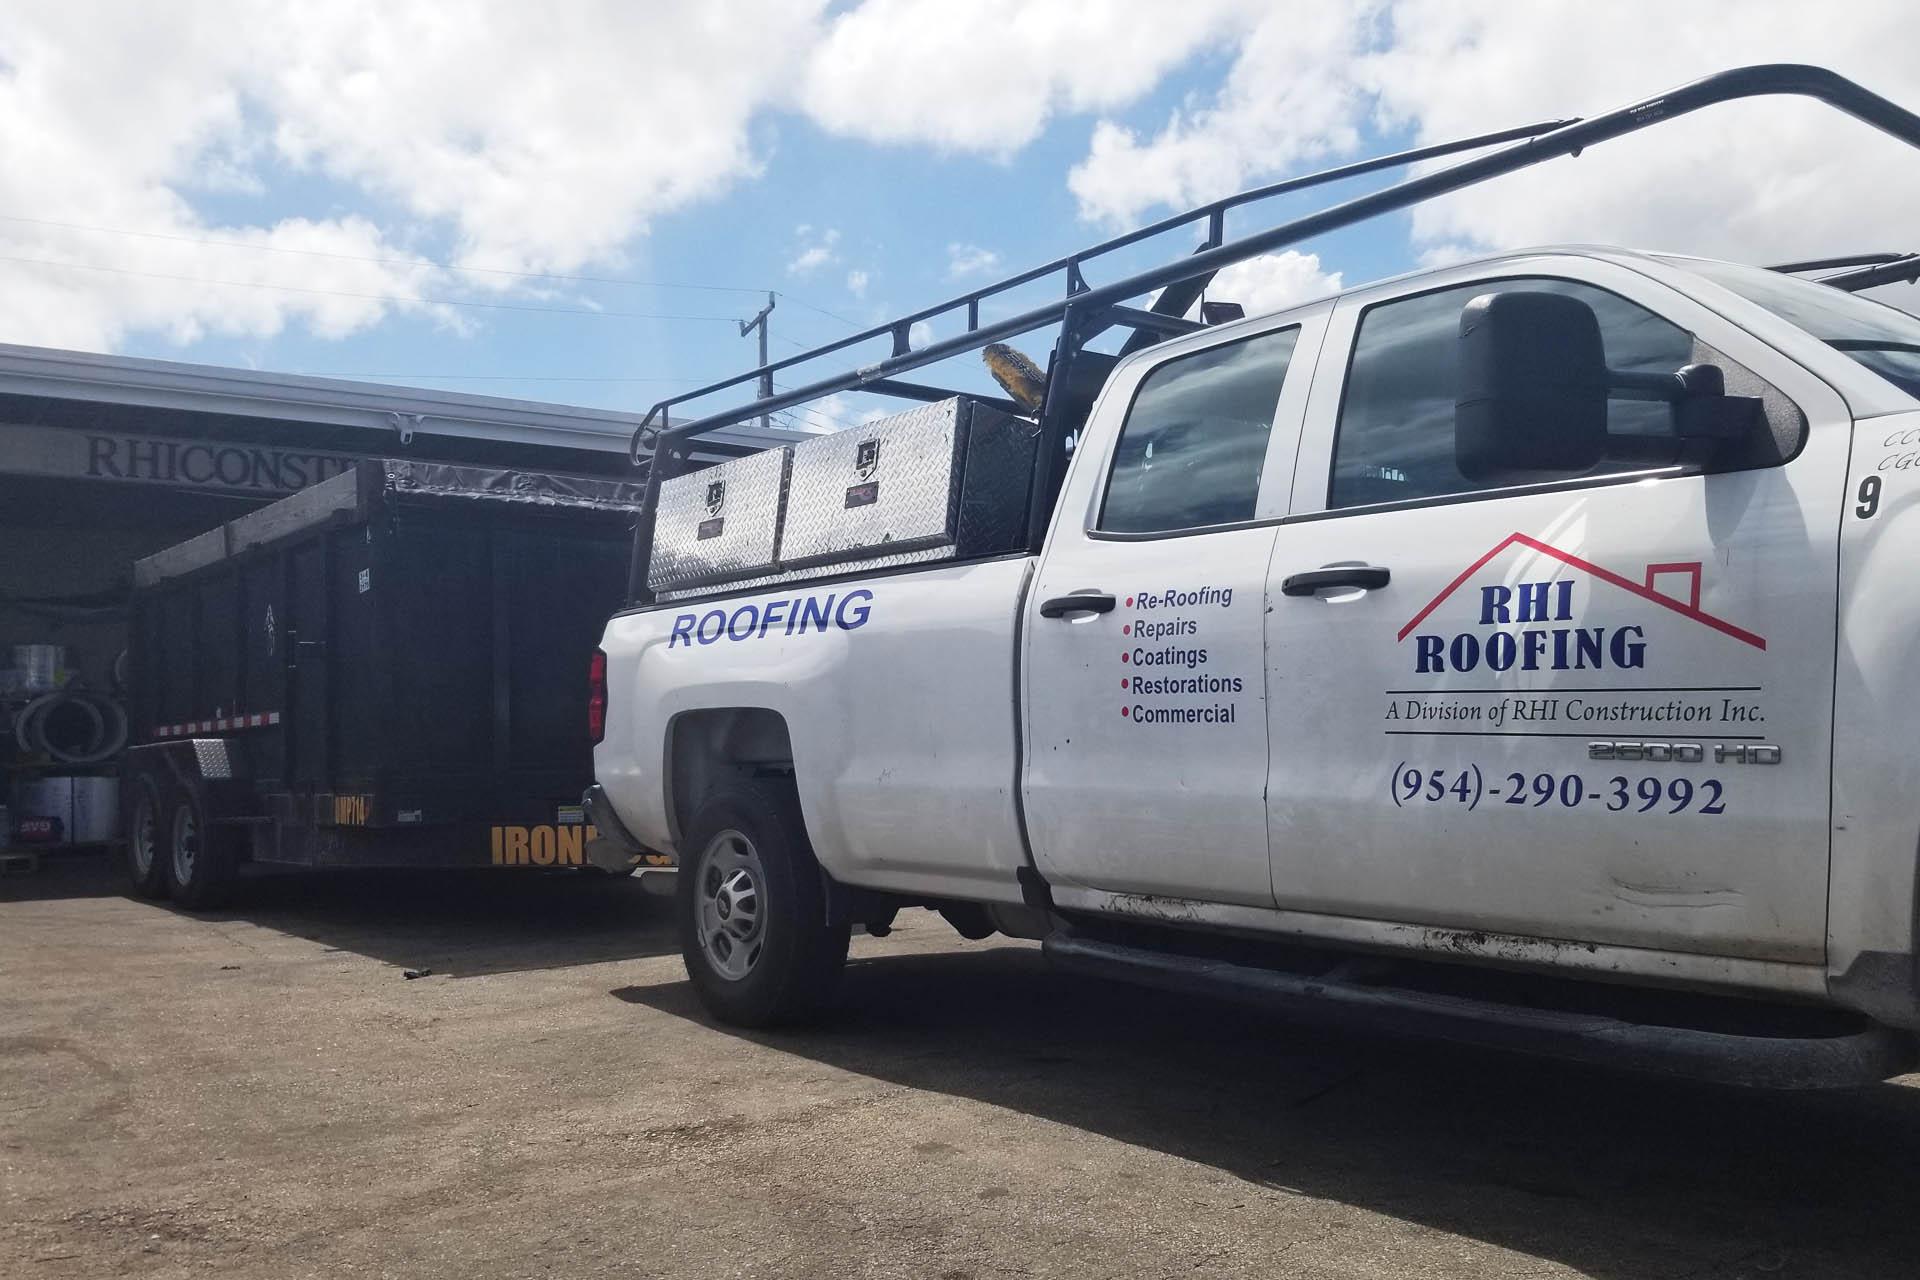 rhi roofing company oakland park